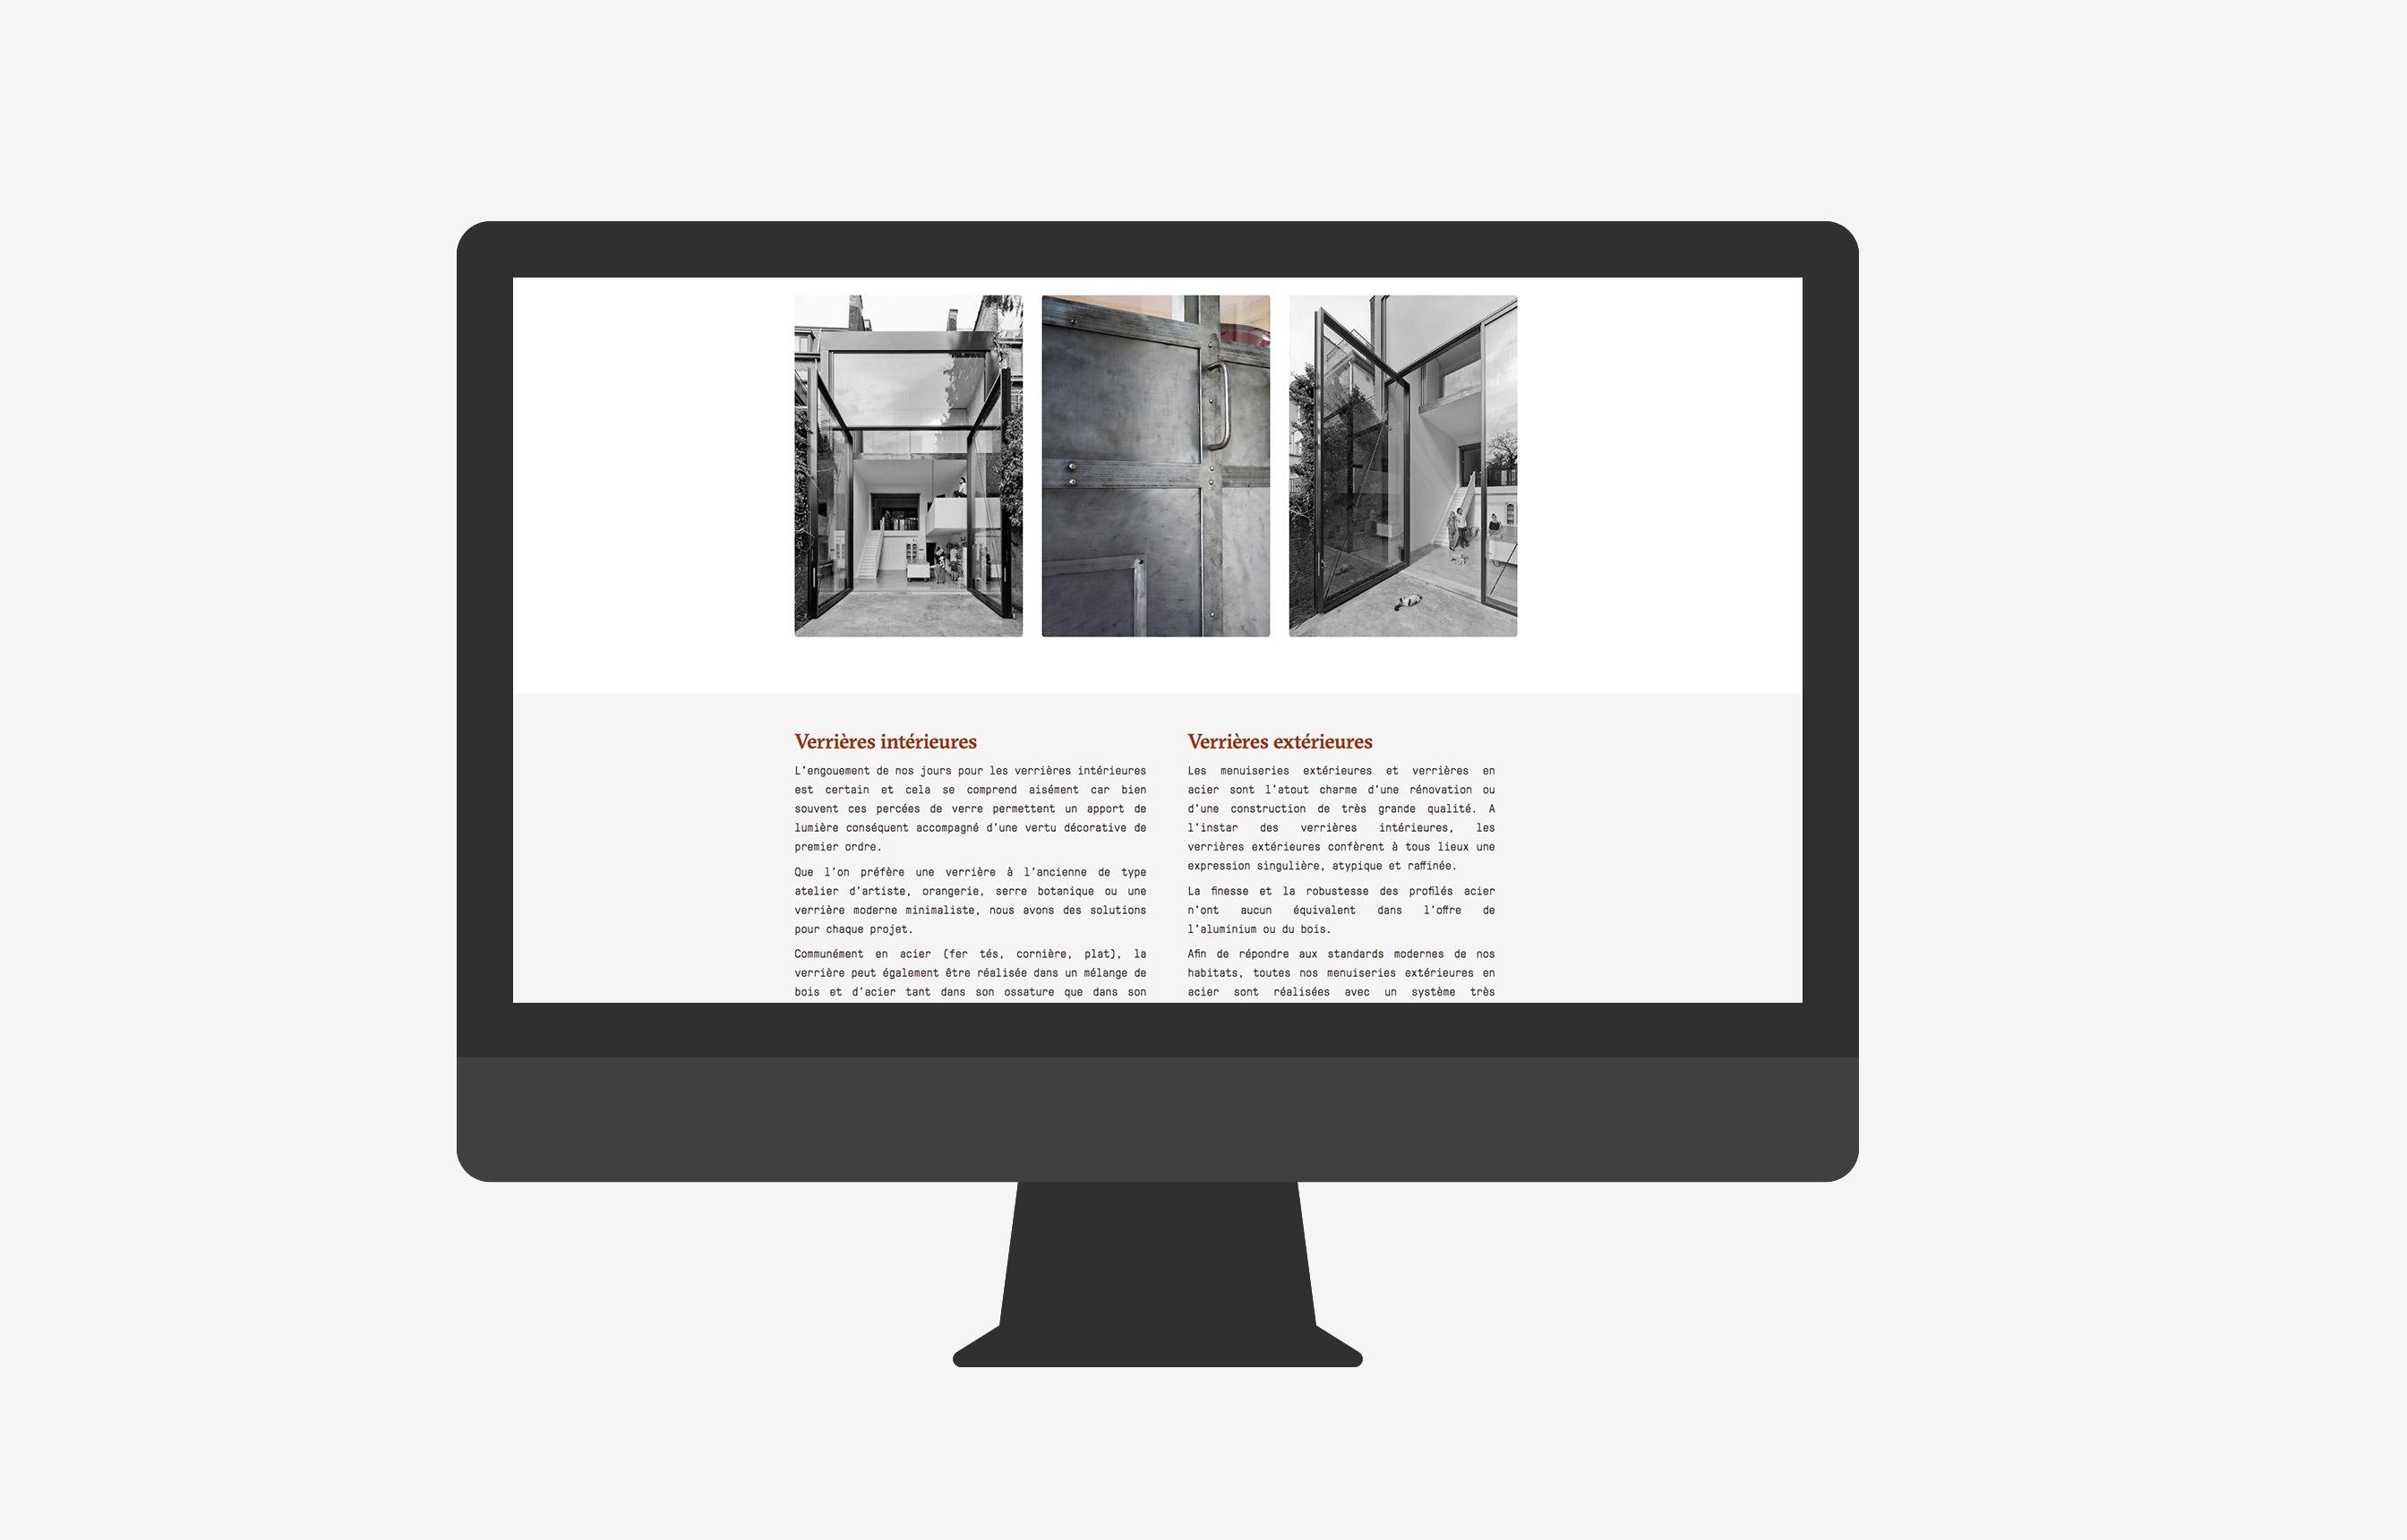 02-verrierelyon-pikteo-webdesign-graphic-design-freelance-paris-bruxelles-londres